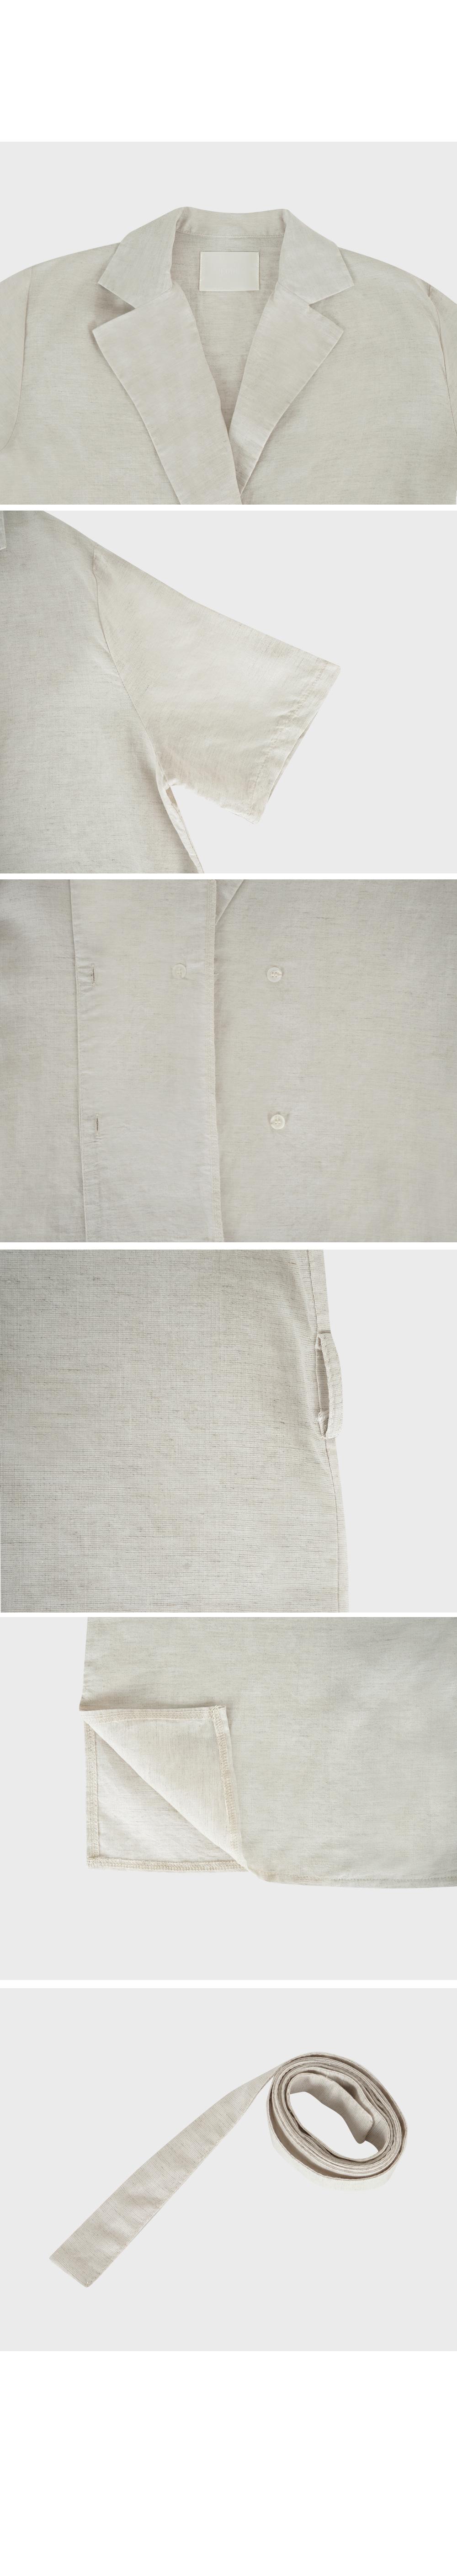 Linen Wrap Blouse Jacket- Holiholic